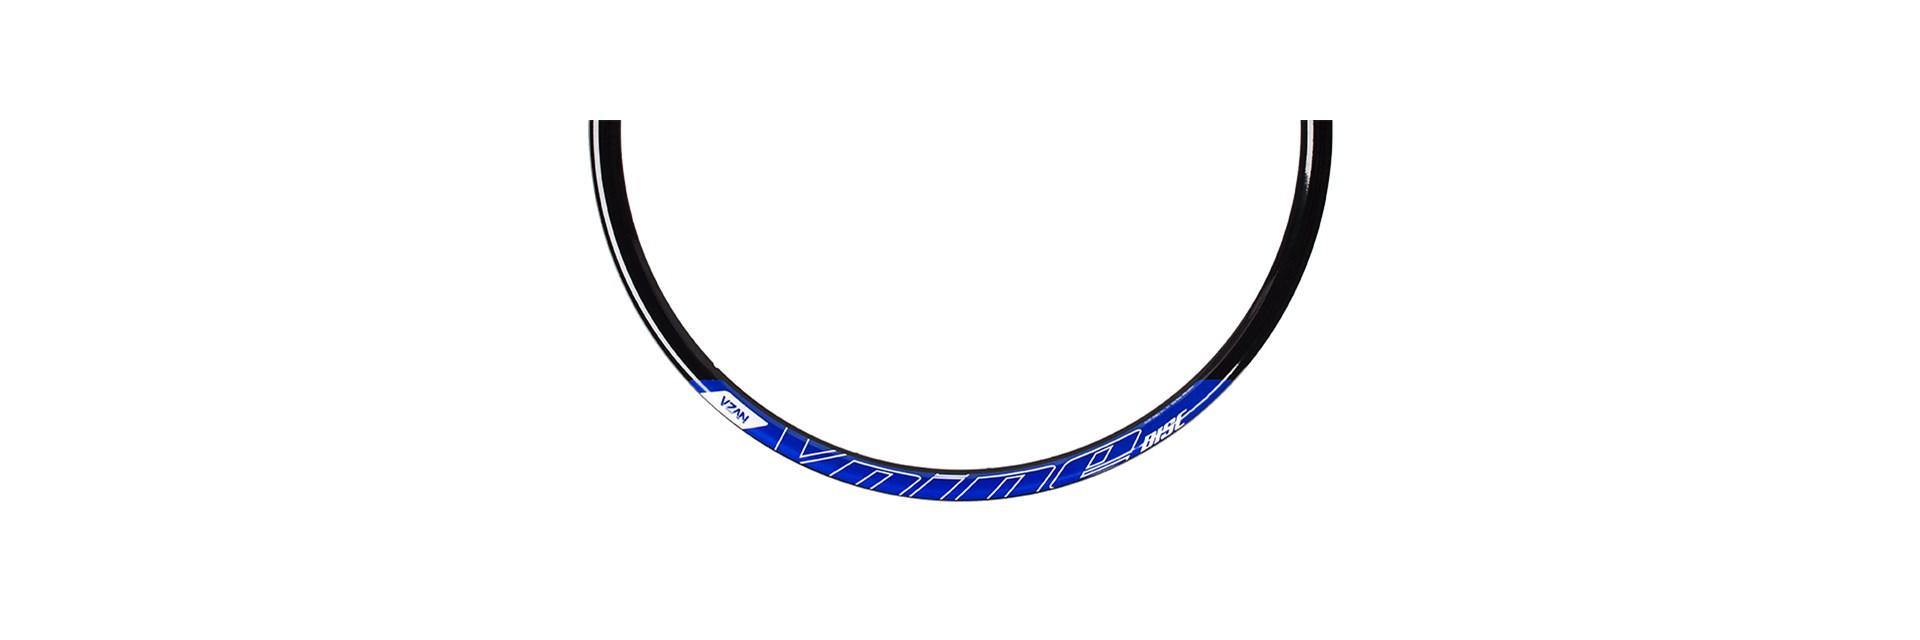 Aro Vnine 29/36F Disc Preto Ad Azul